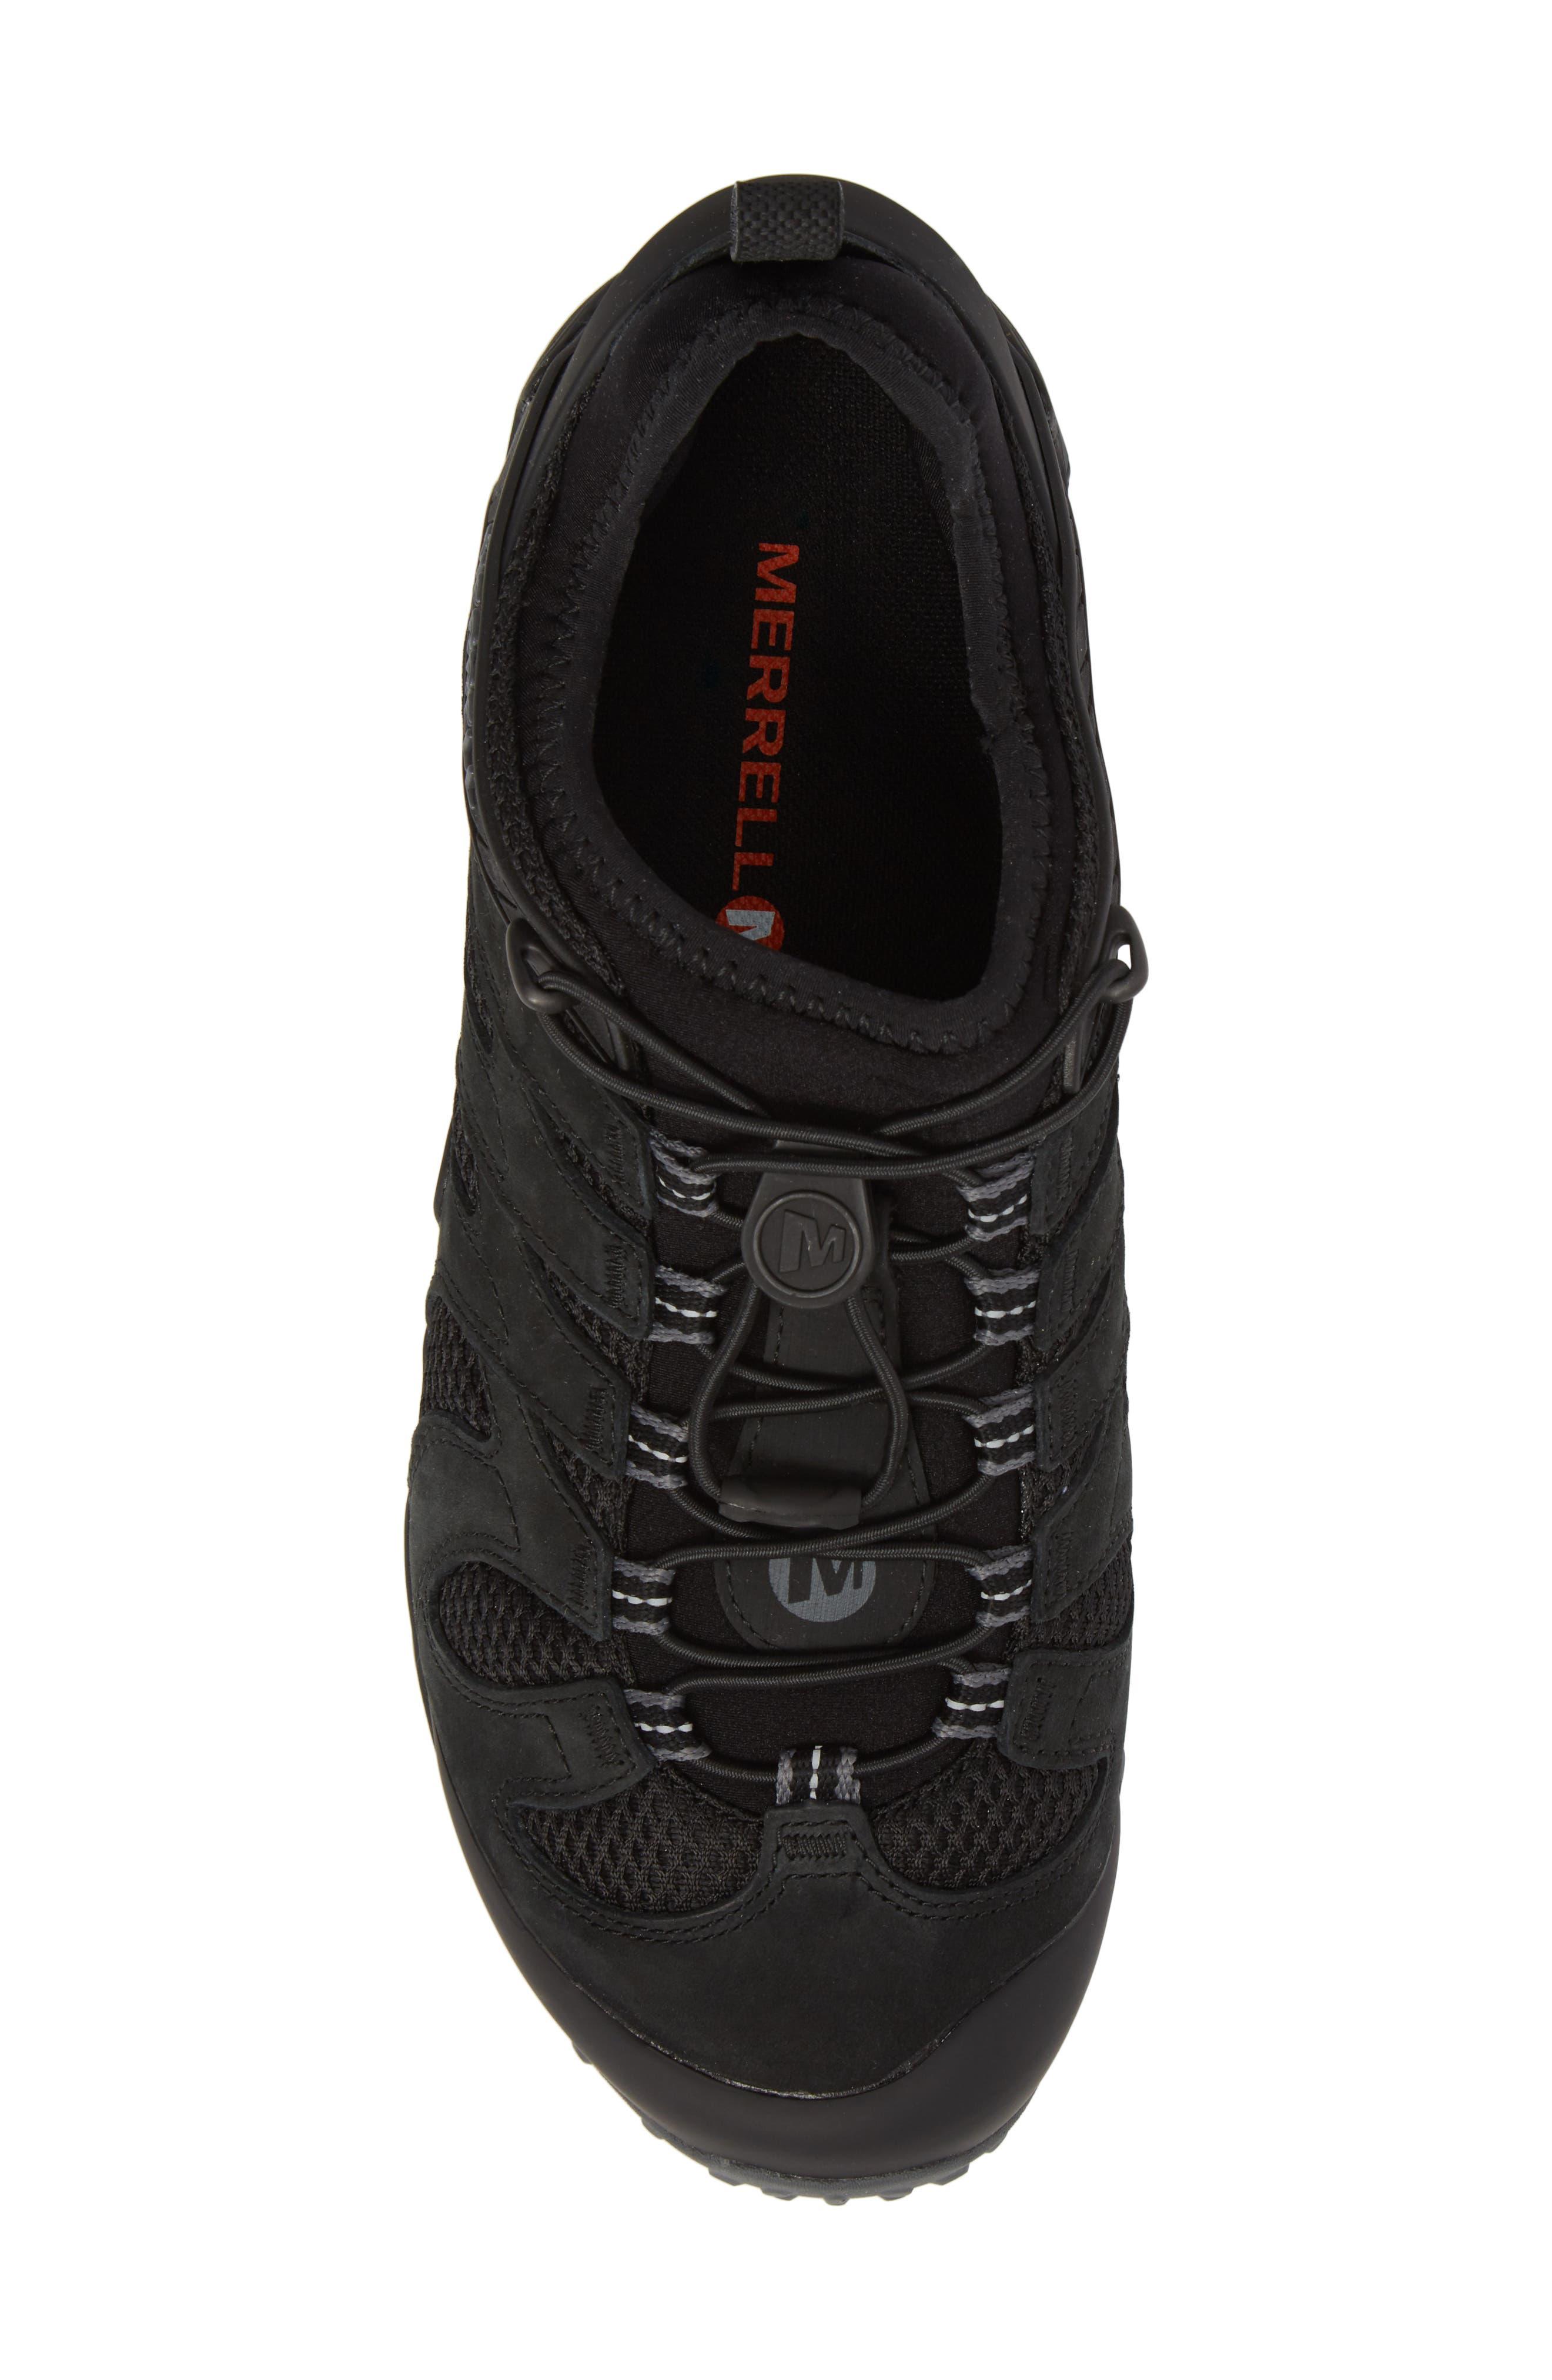 MERRELL, Chameleon 7 Stretch Hiking Shoe, Alternate thumbnail 5, color, BLACK